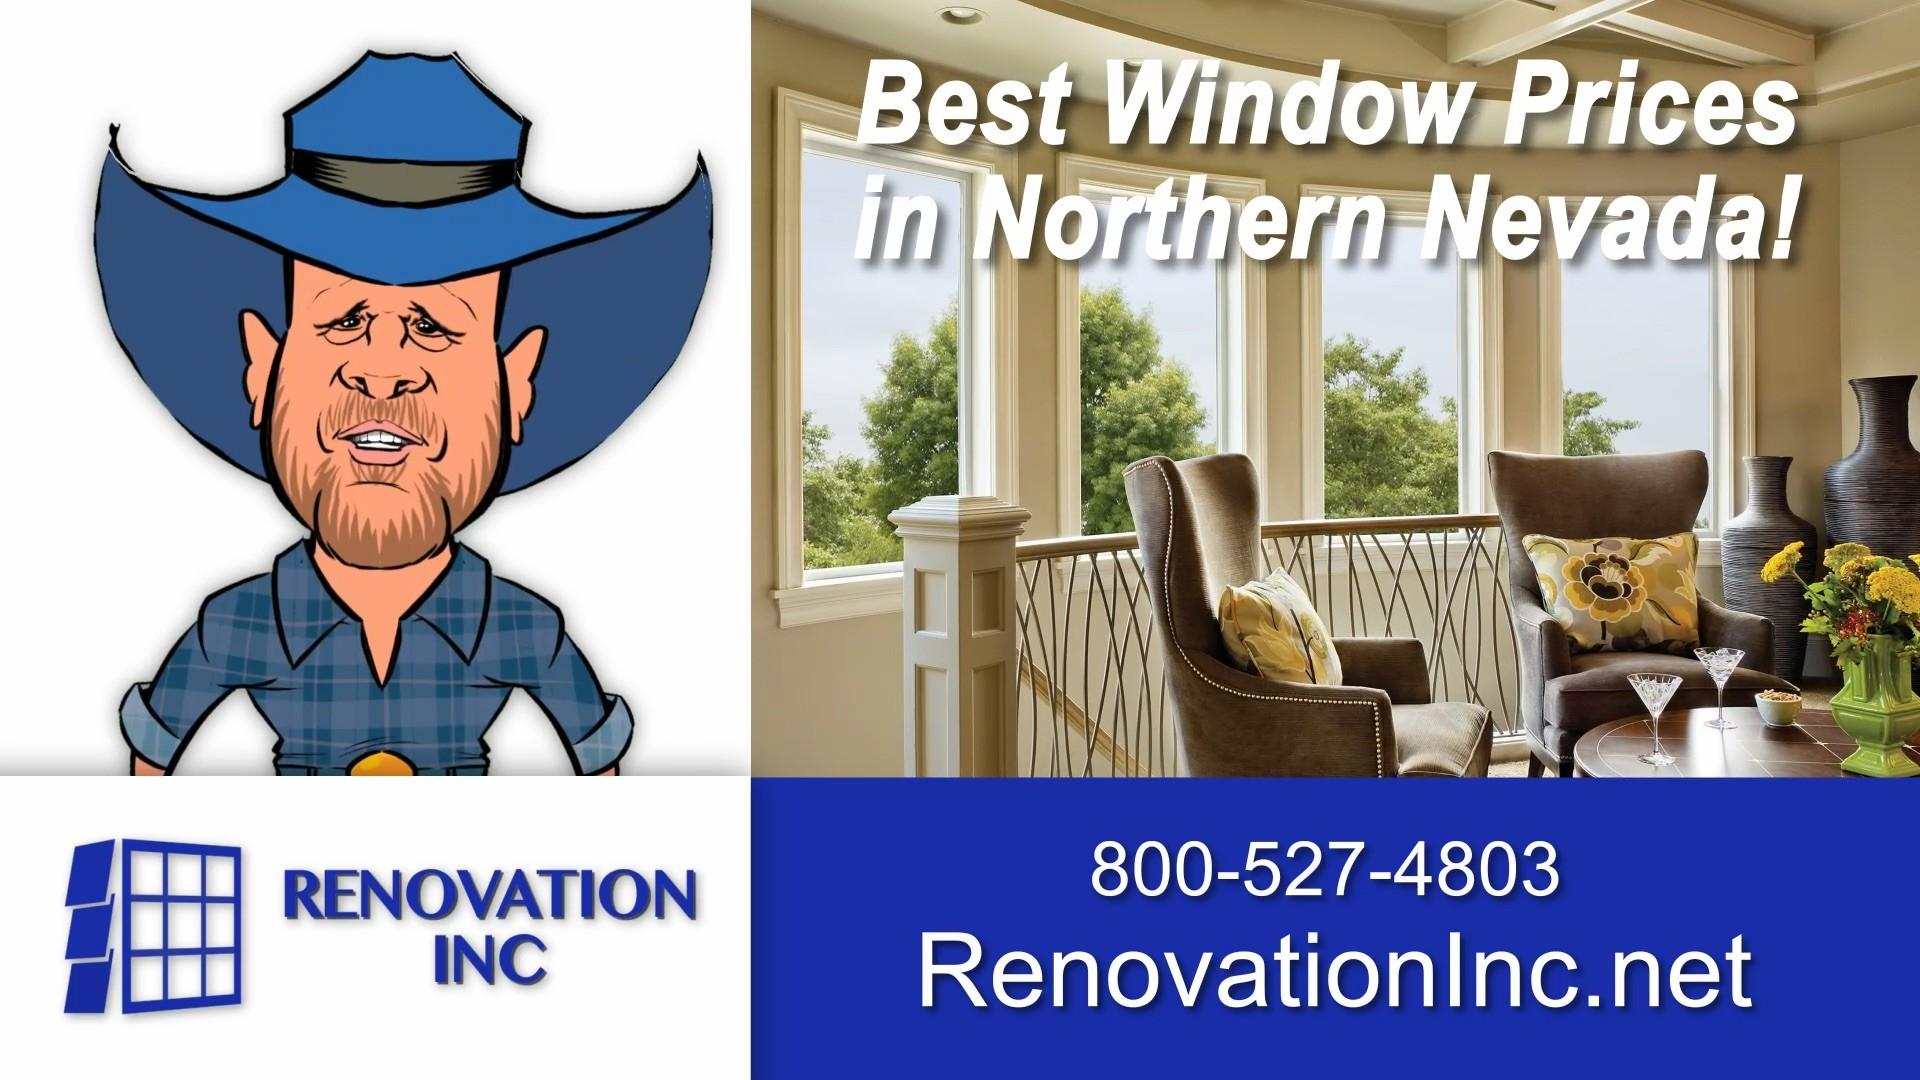 Renovation Inc: Wild Bill